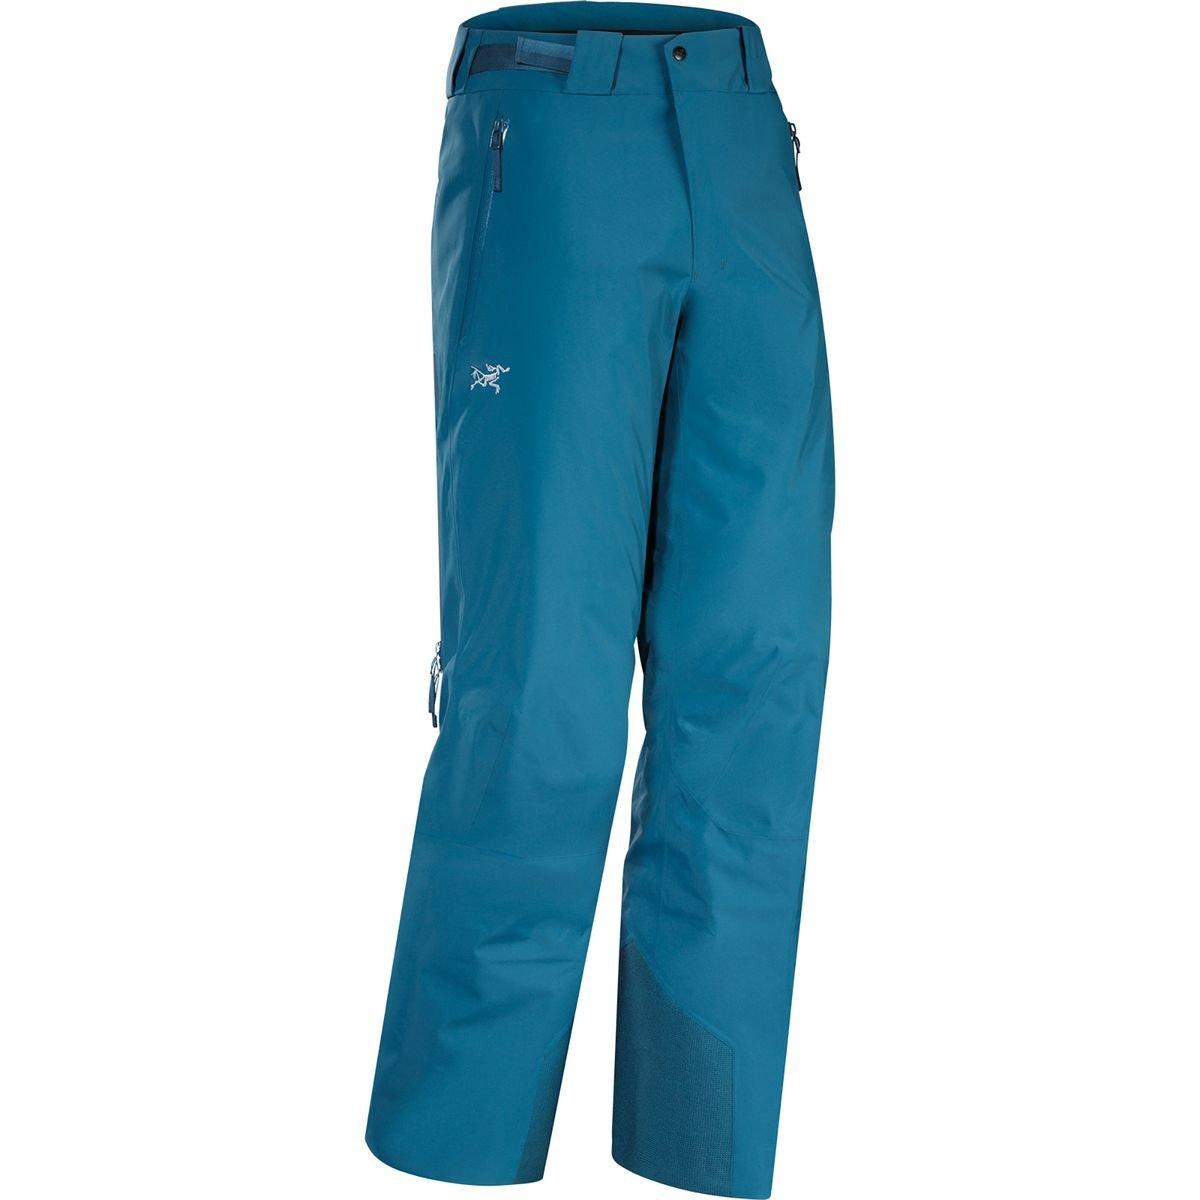 Arc ' teryx Chilkoot Pant – Men 's B0163XK8NG ブルー(Legion Blue) LG x R